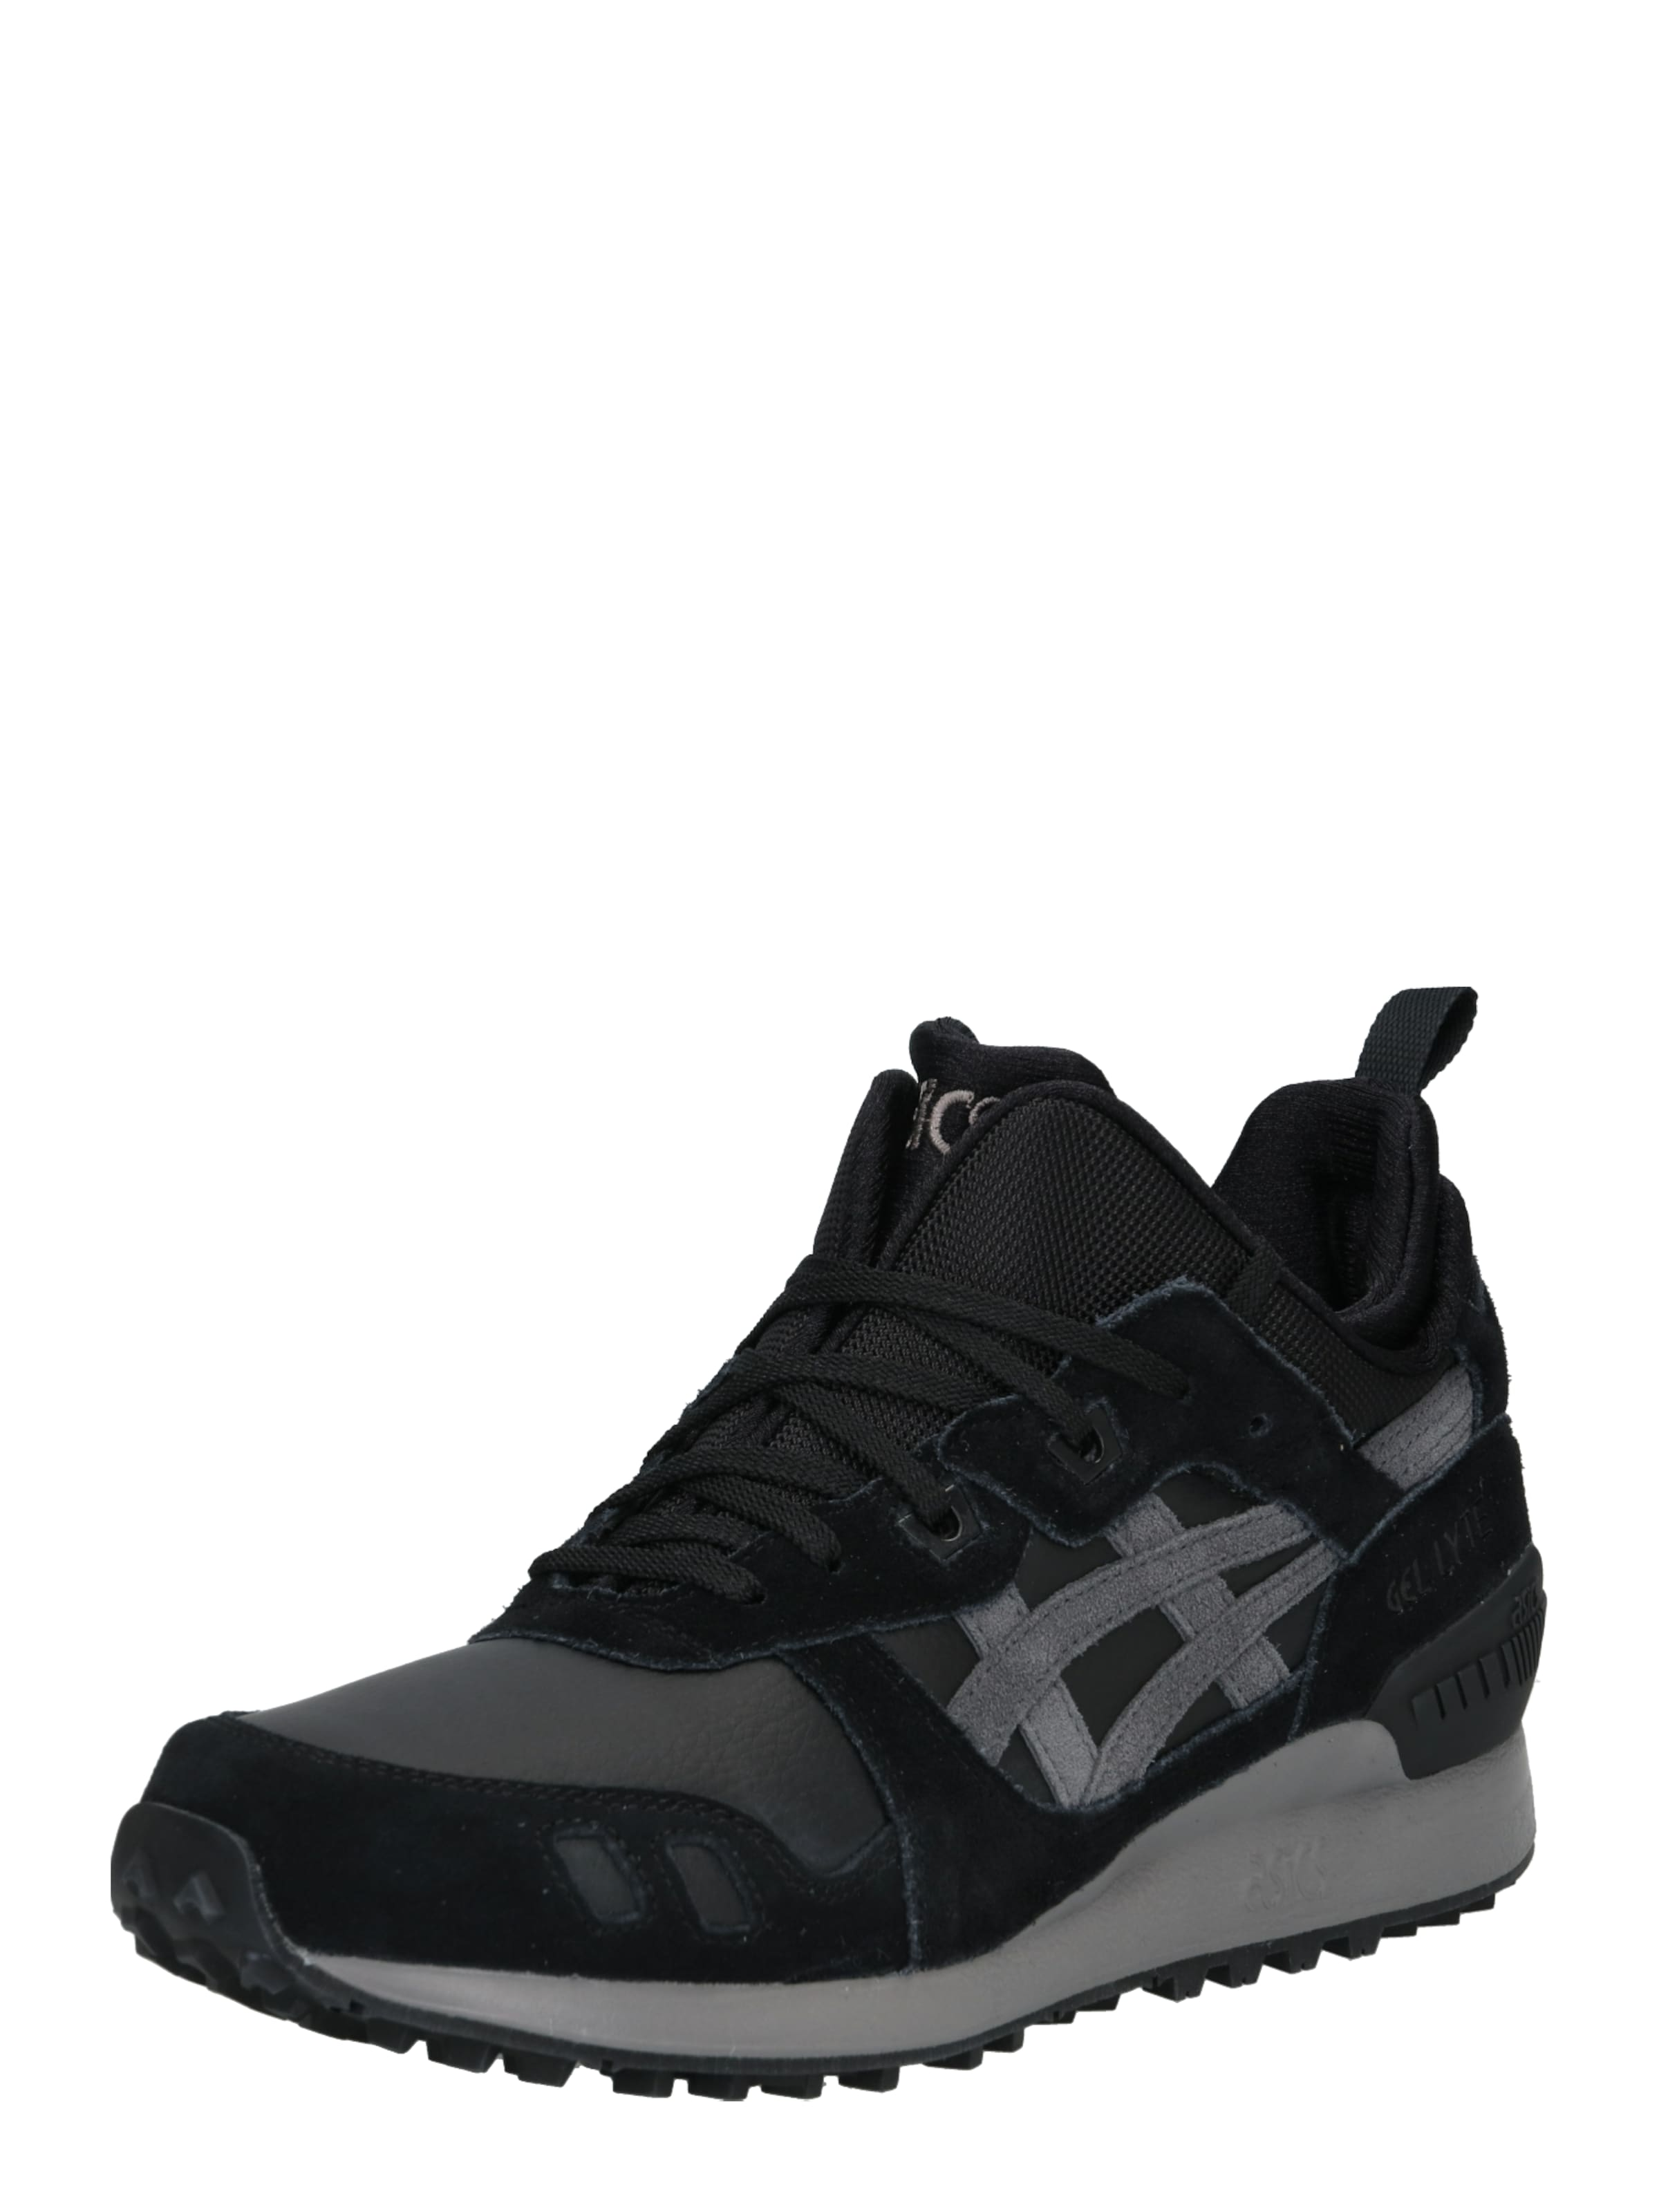 Asics Tiger In Sneaker Schwarz Mt' lyte 'gel QdCxoBWre